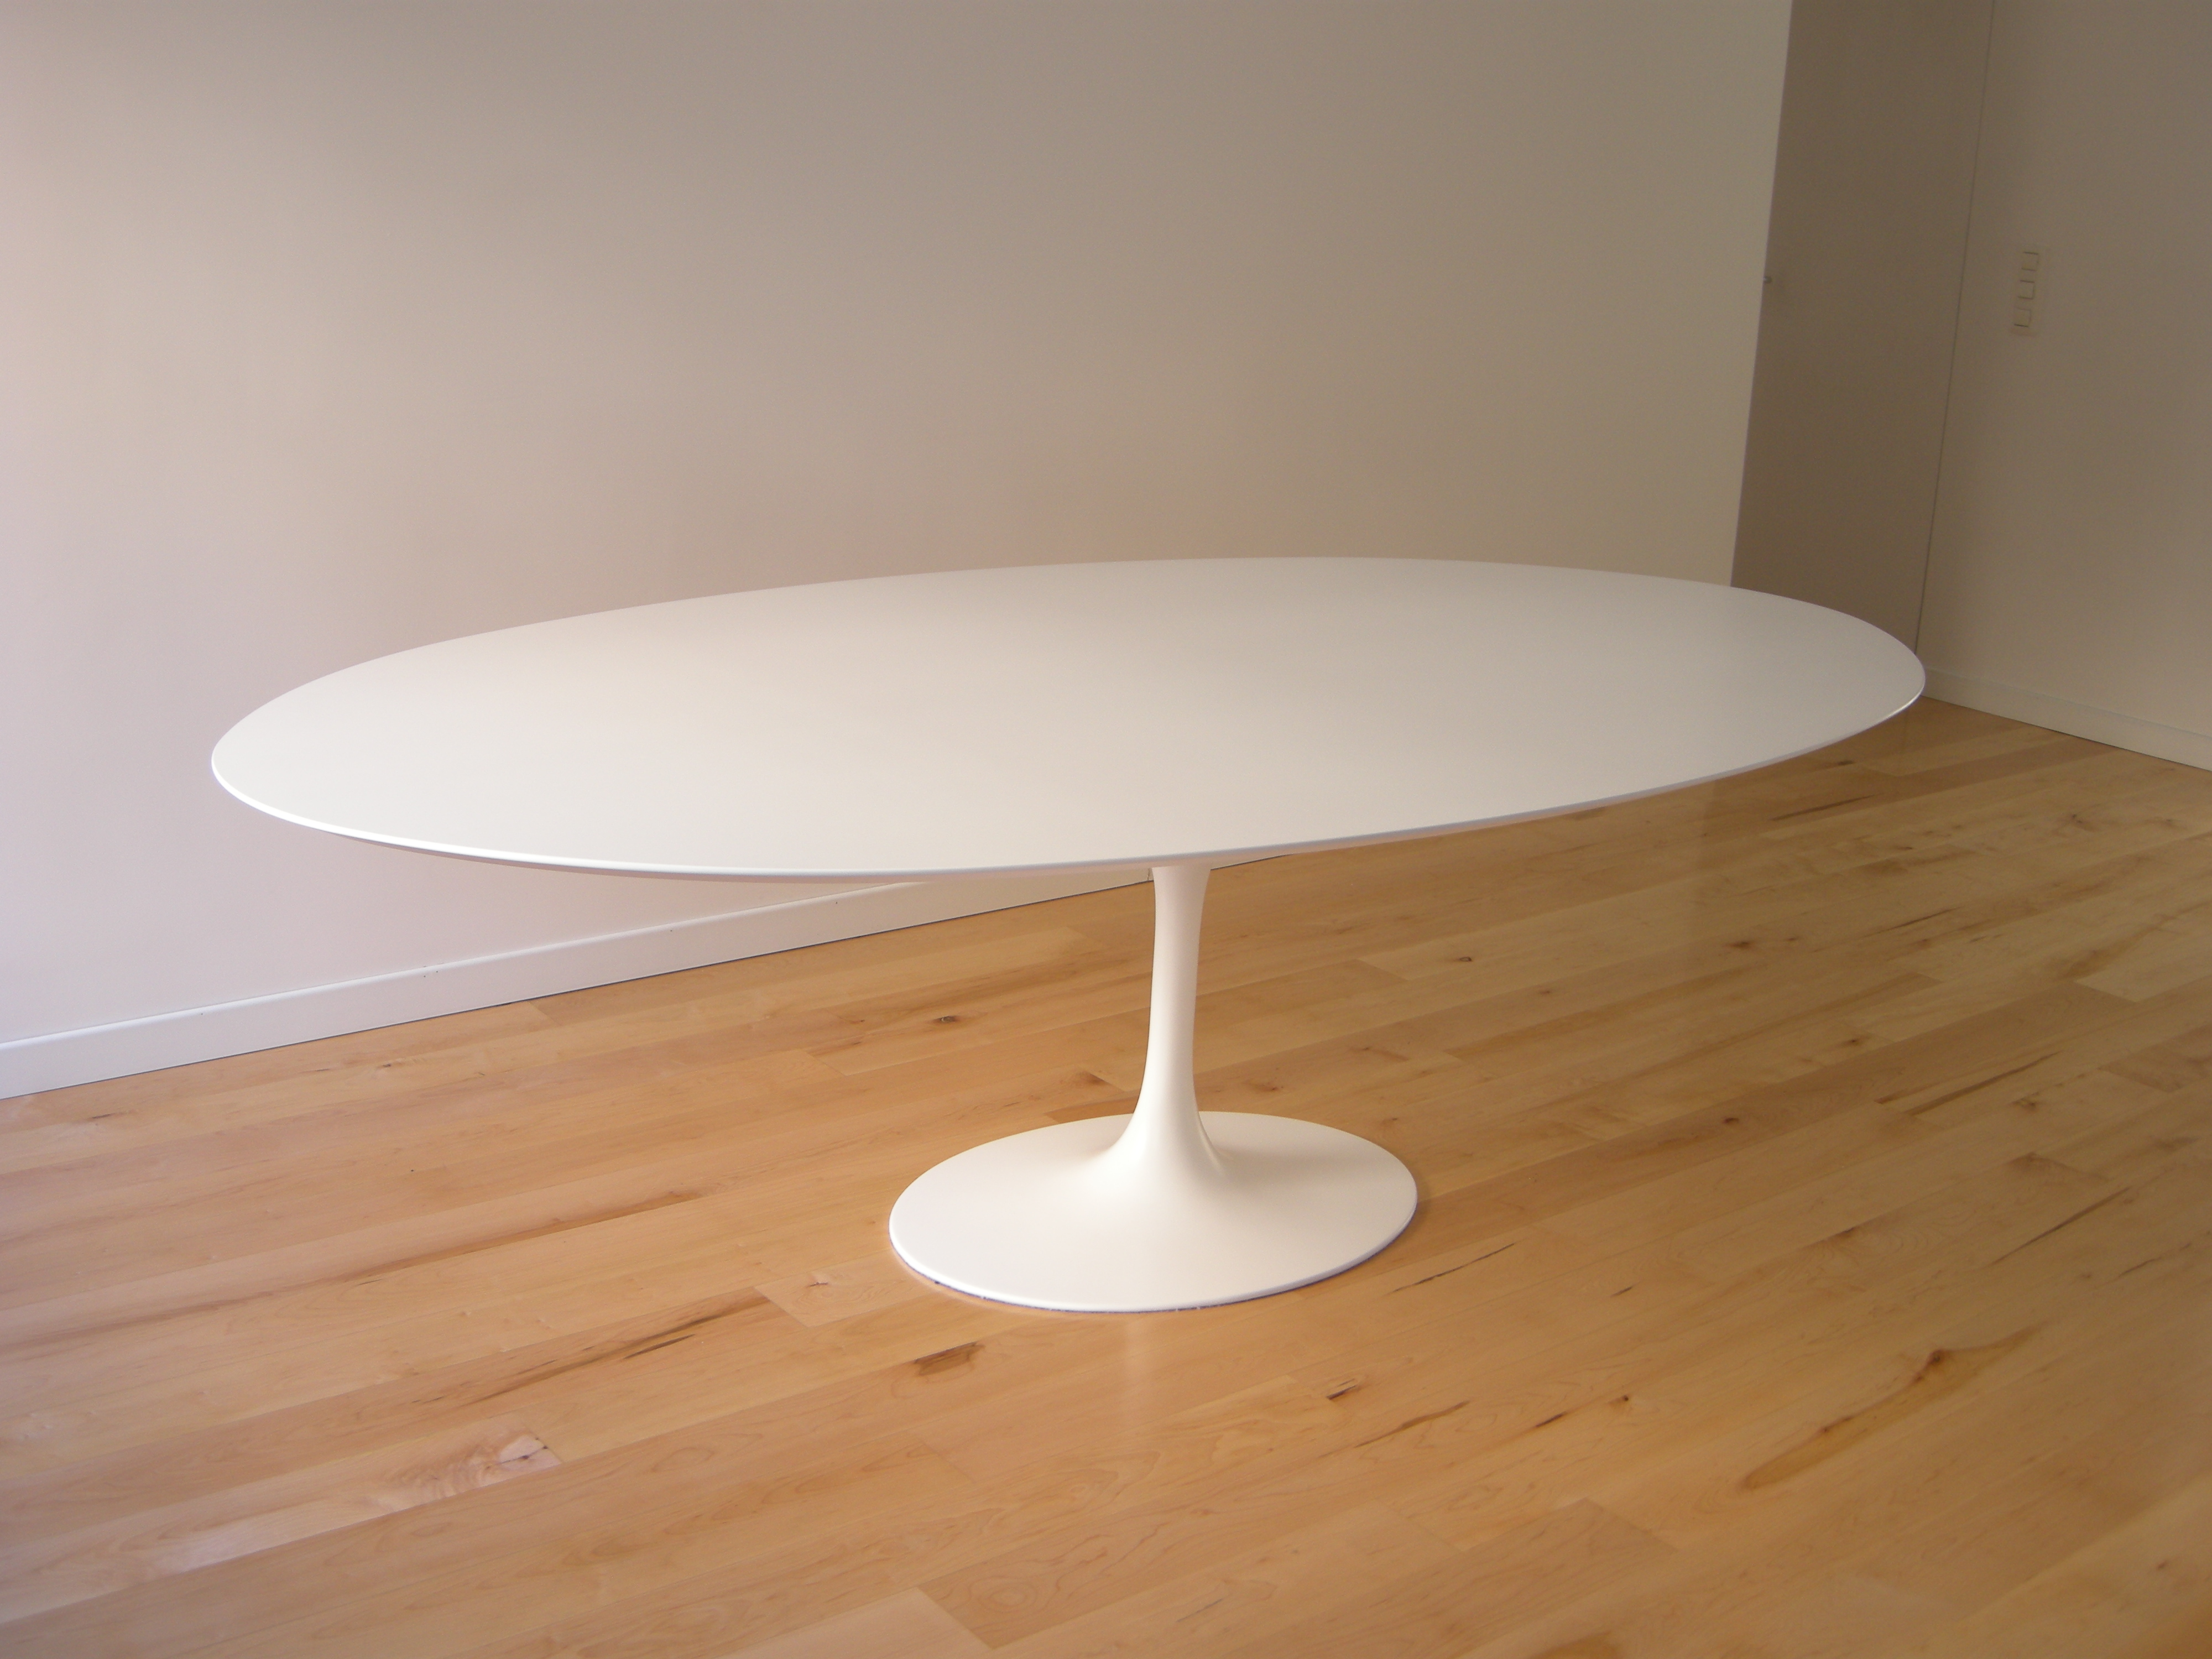 Eero Saarinen - Tavolo Tulip, ovale, con piano in MDF bianco o nero